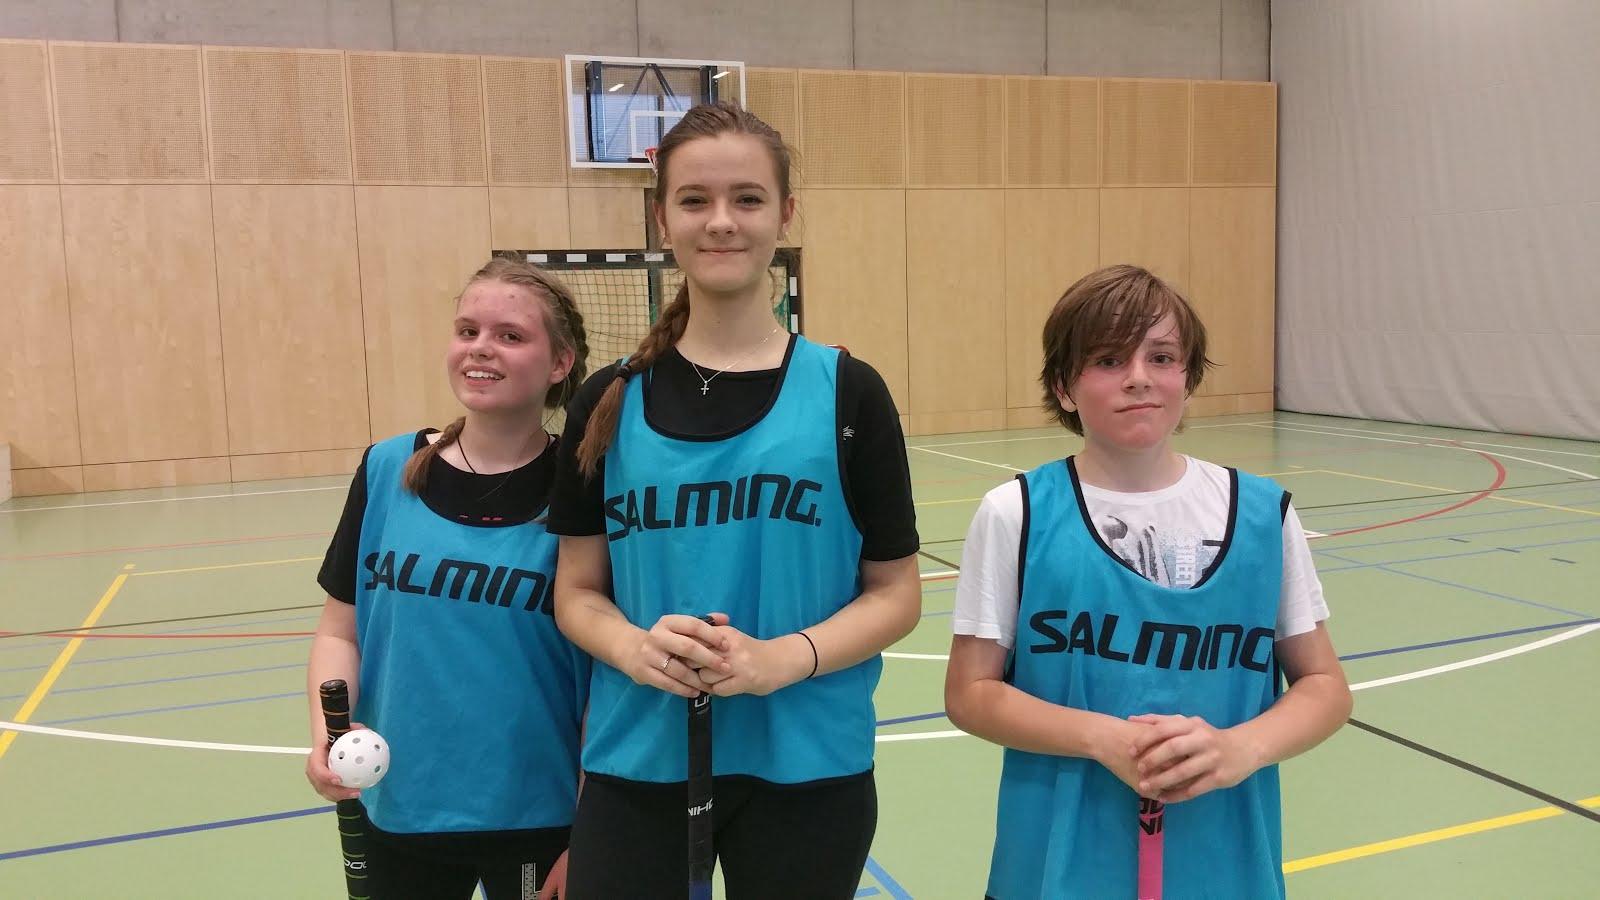 Simone, Julija und Matthias